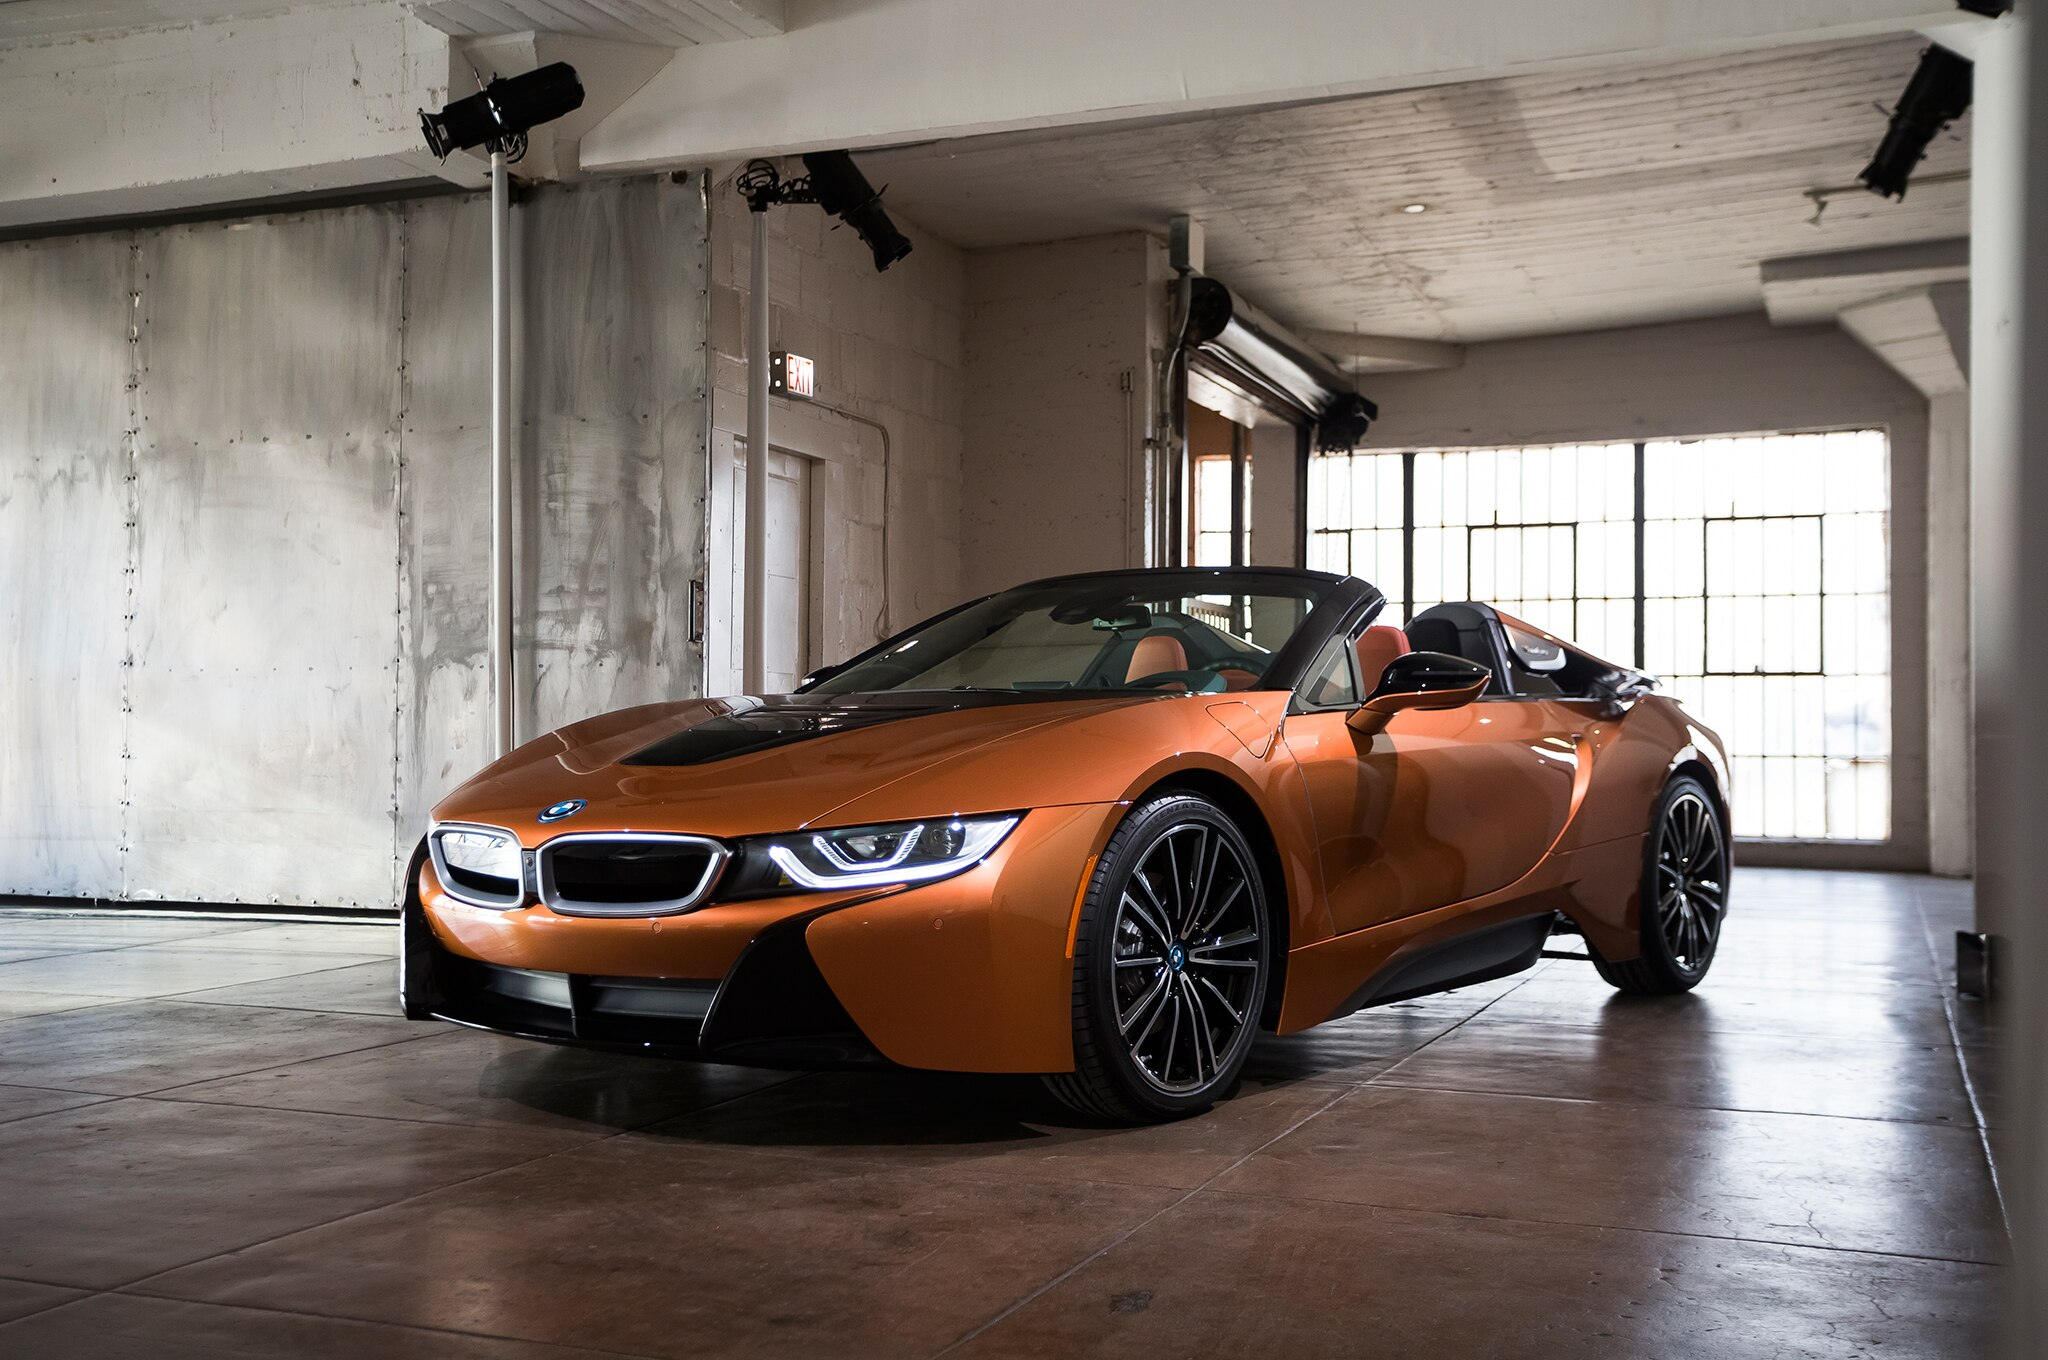 2019 BMW I8 Roadster Front Three Quarter 01 1